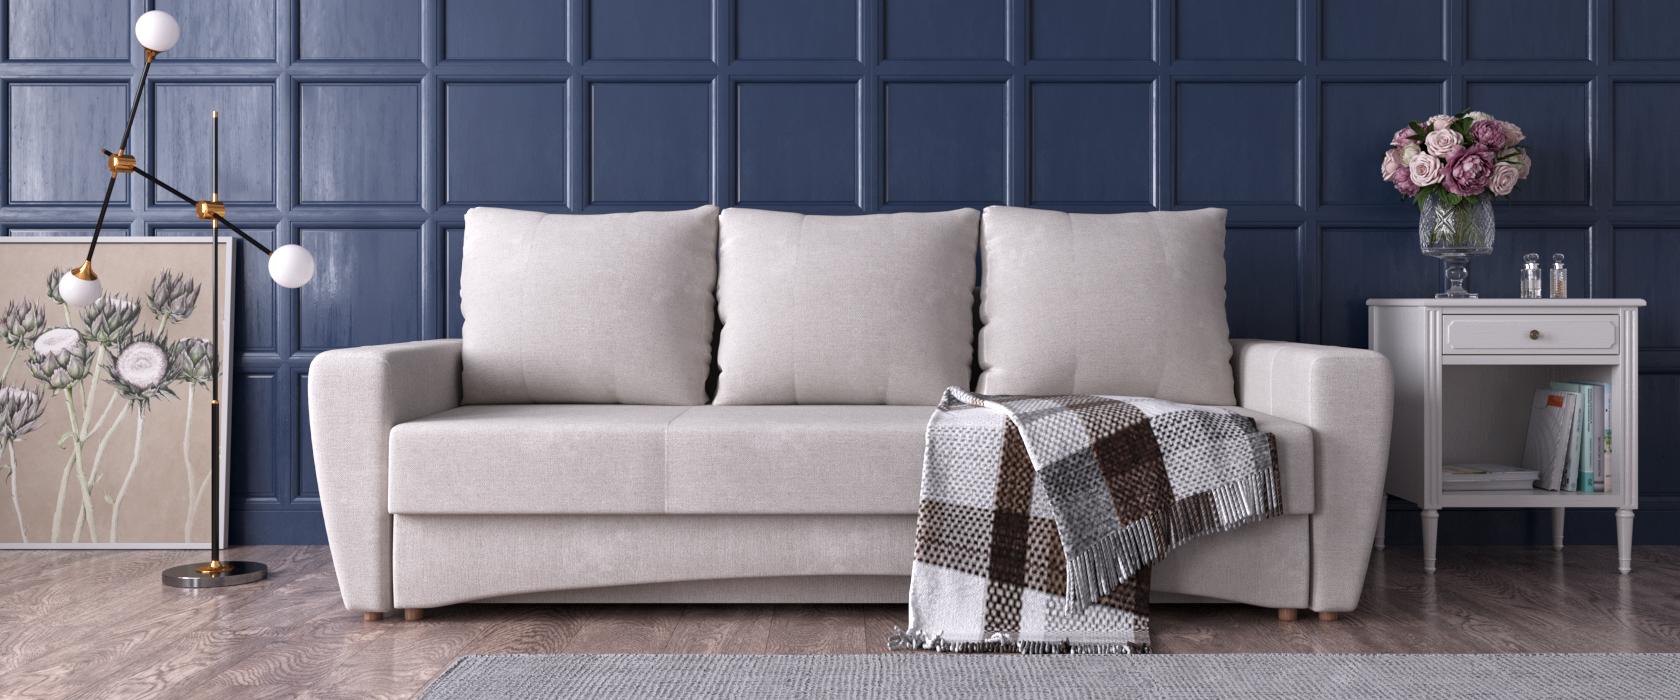 Трехместный диван Andrea - Фото 1 - Pufetto